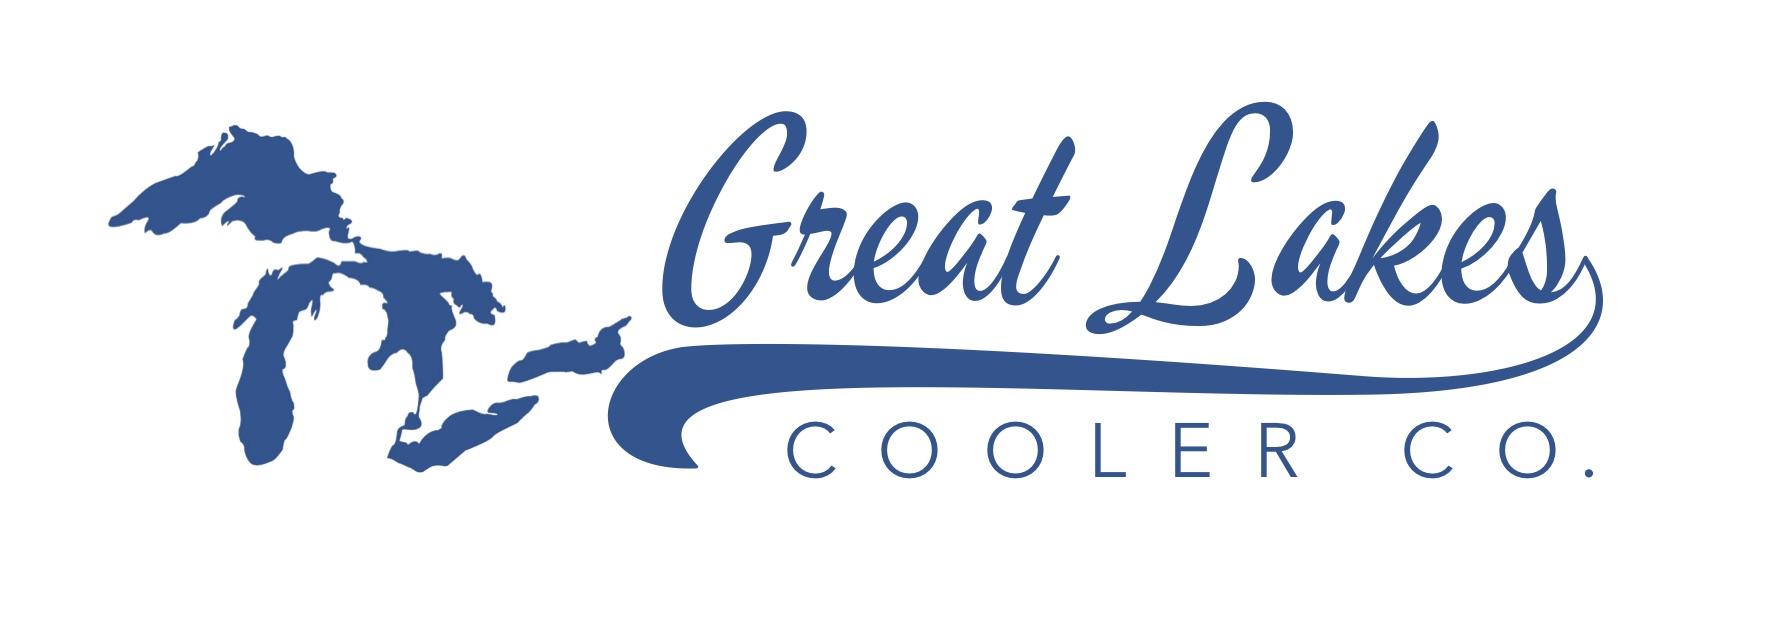 https://secureservercdn.net/198.71.233.31/ohh.6fc.myftpupload.com/wp-content/uploads/2019/08/Great-Lakes-Logo-JPG.jpg